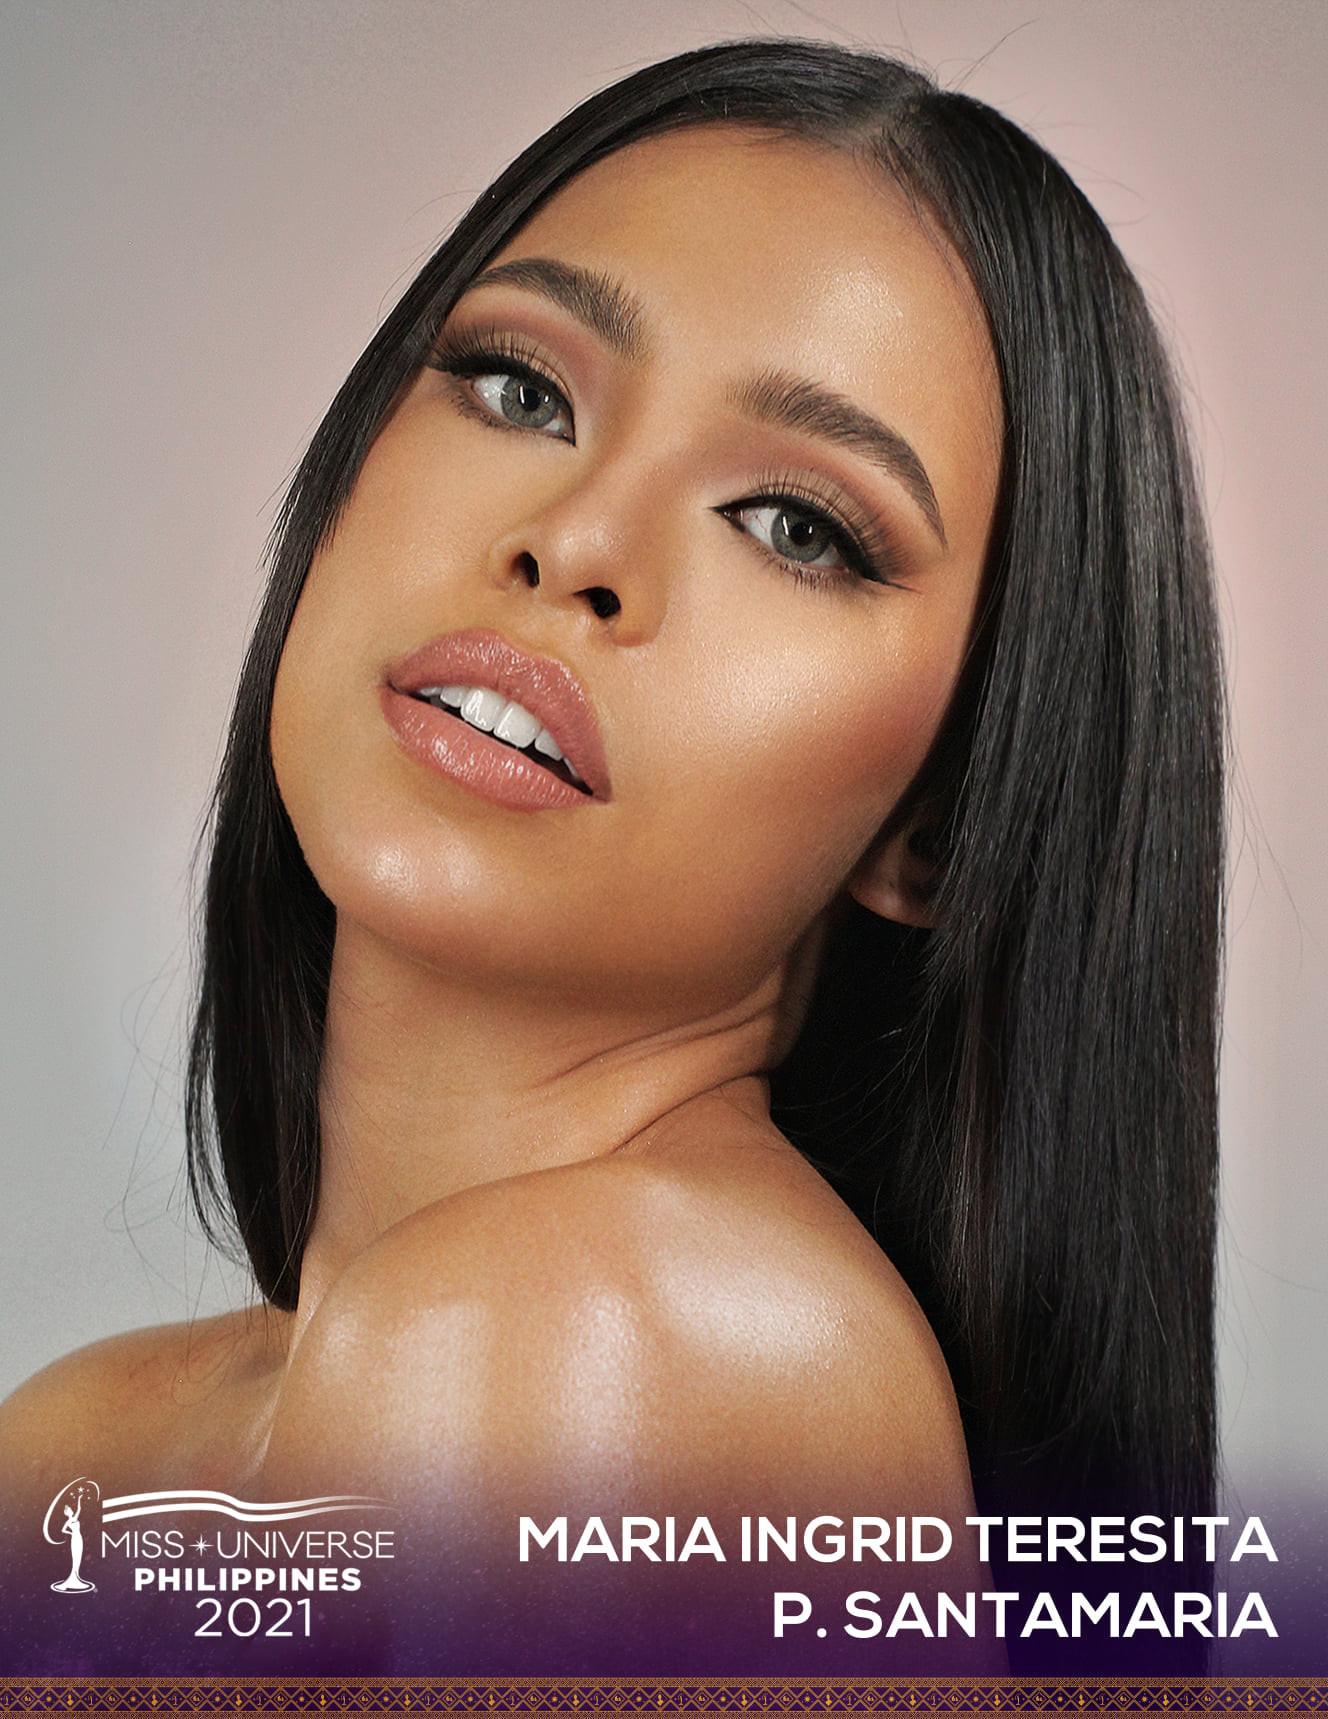 pre-candidatas a miss universe philippines 2021. - Página 2 AlKdlI